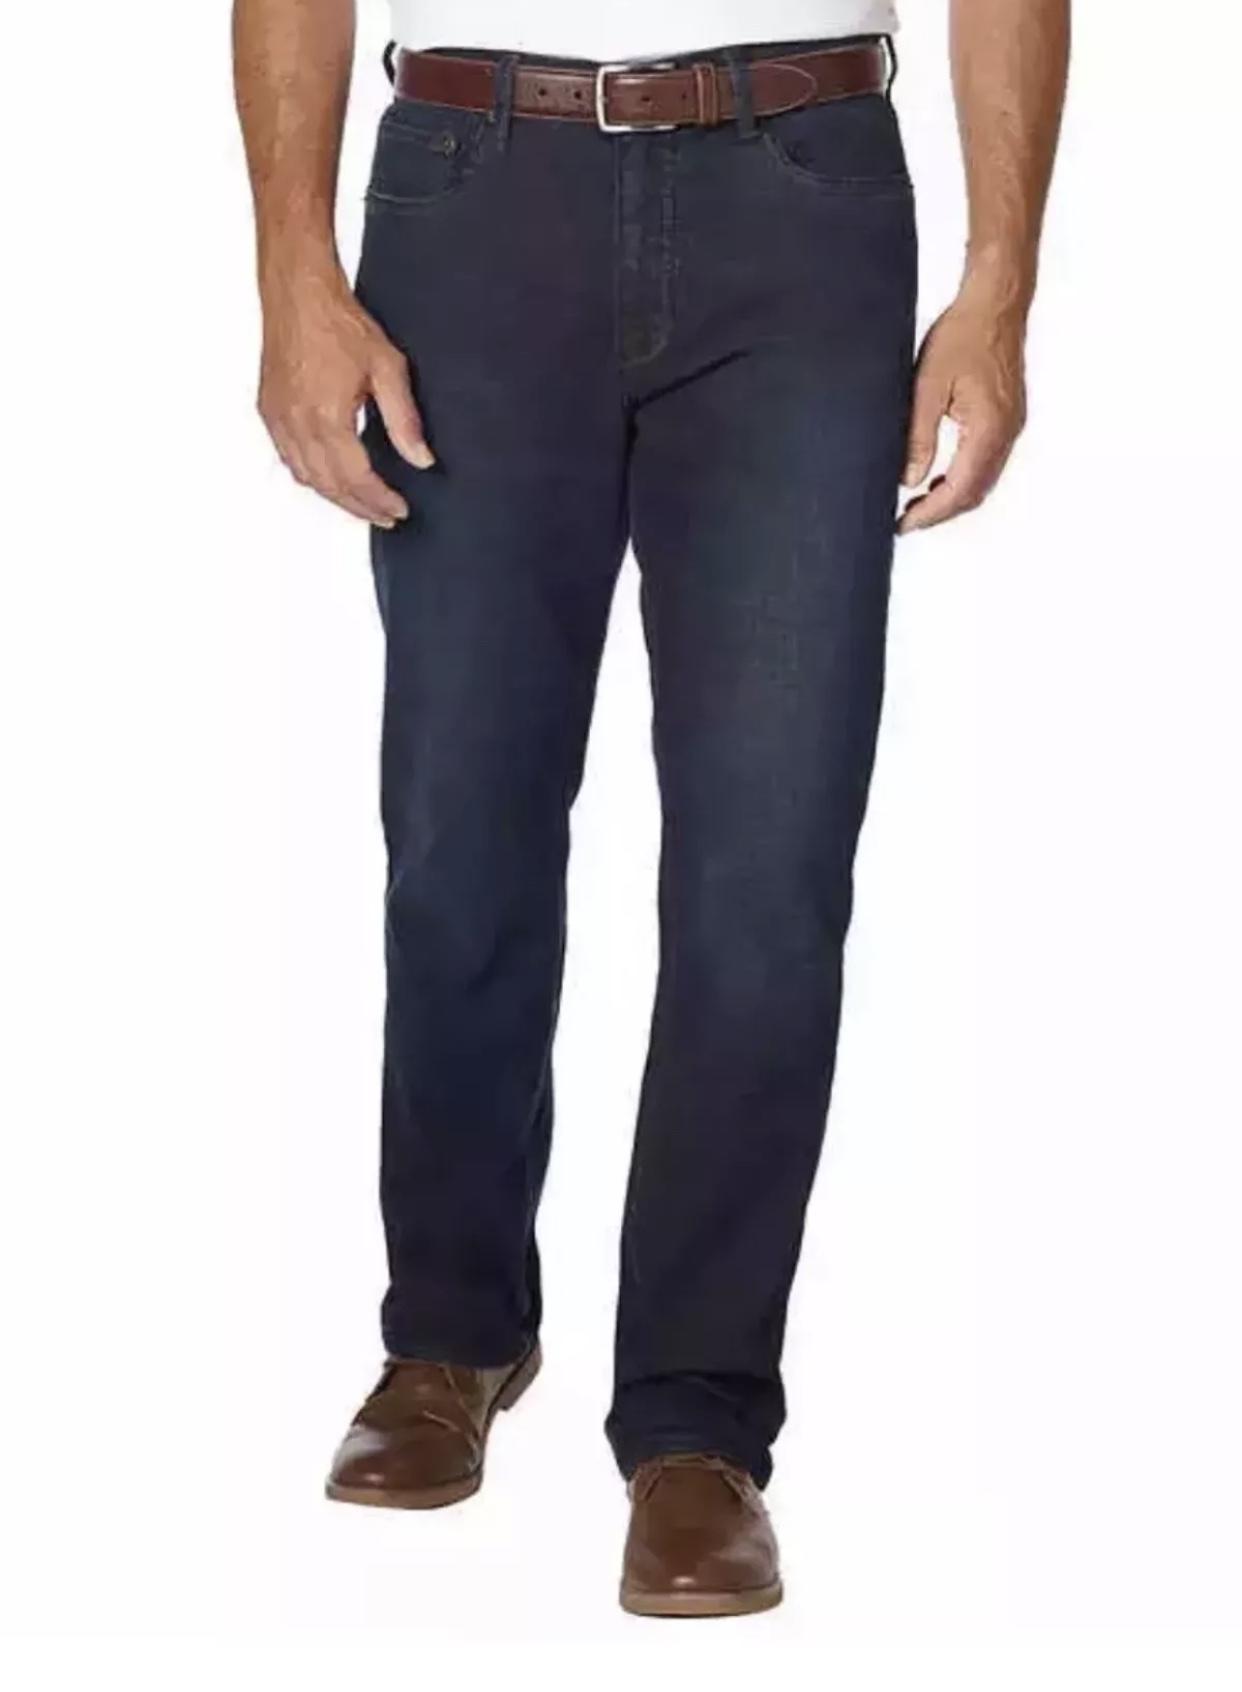 Fruit of the Loom tshirt 145g Cotton Plain Blank Men/'s T shirt T-Shirt lot SS048